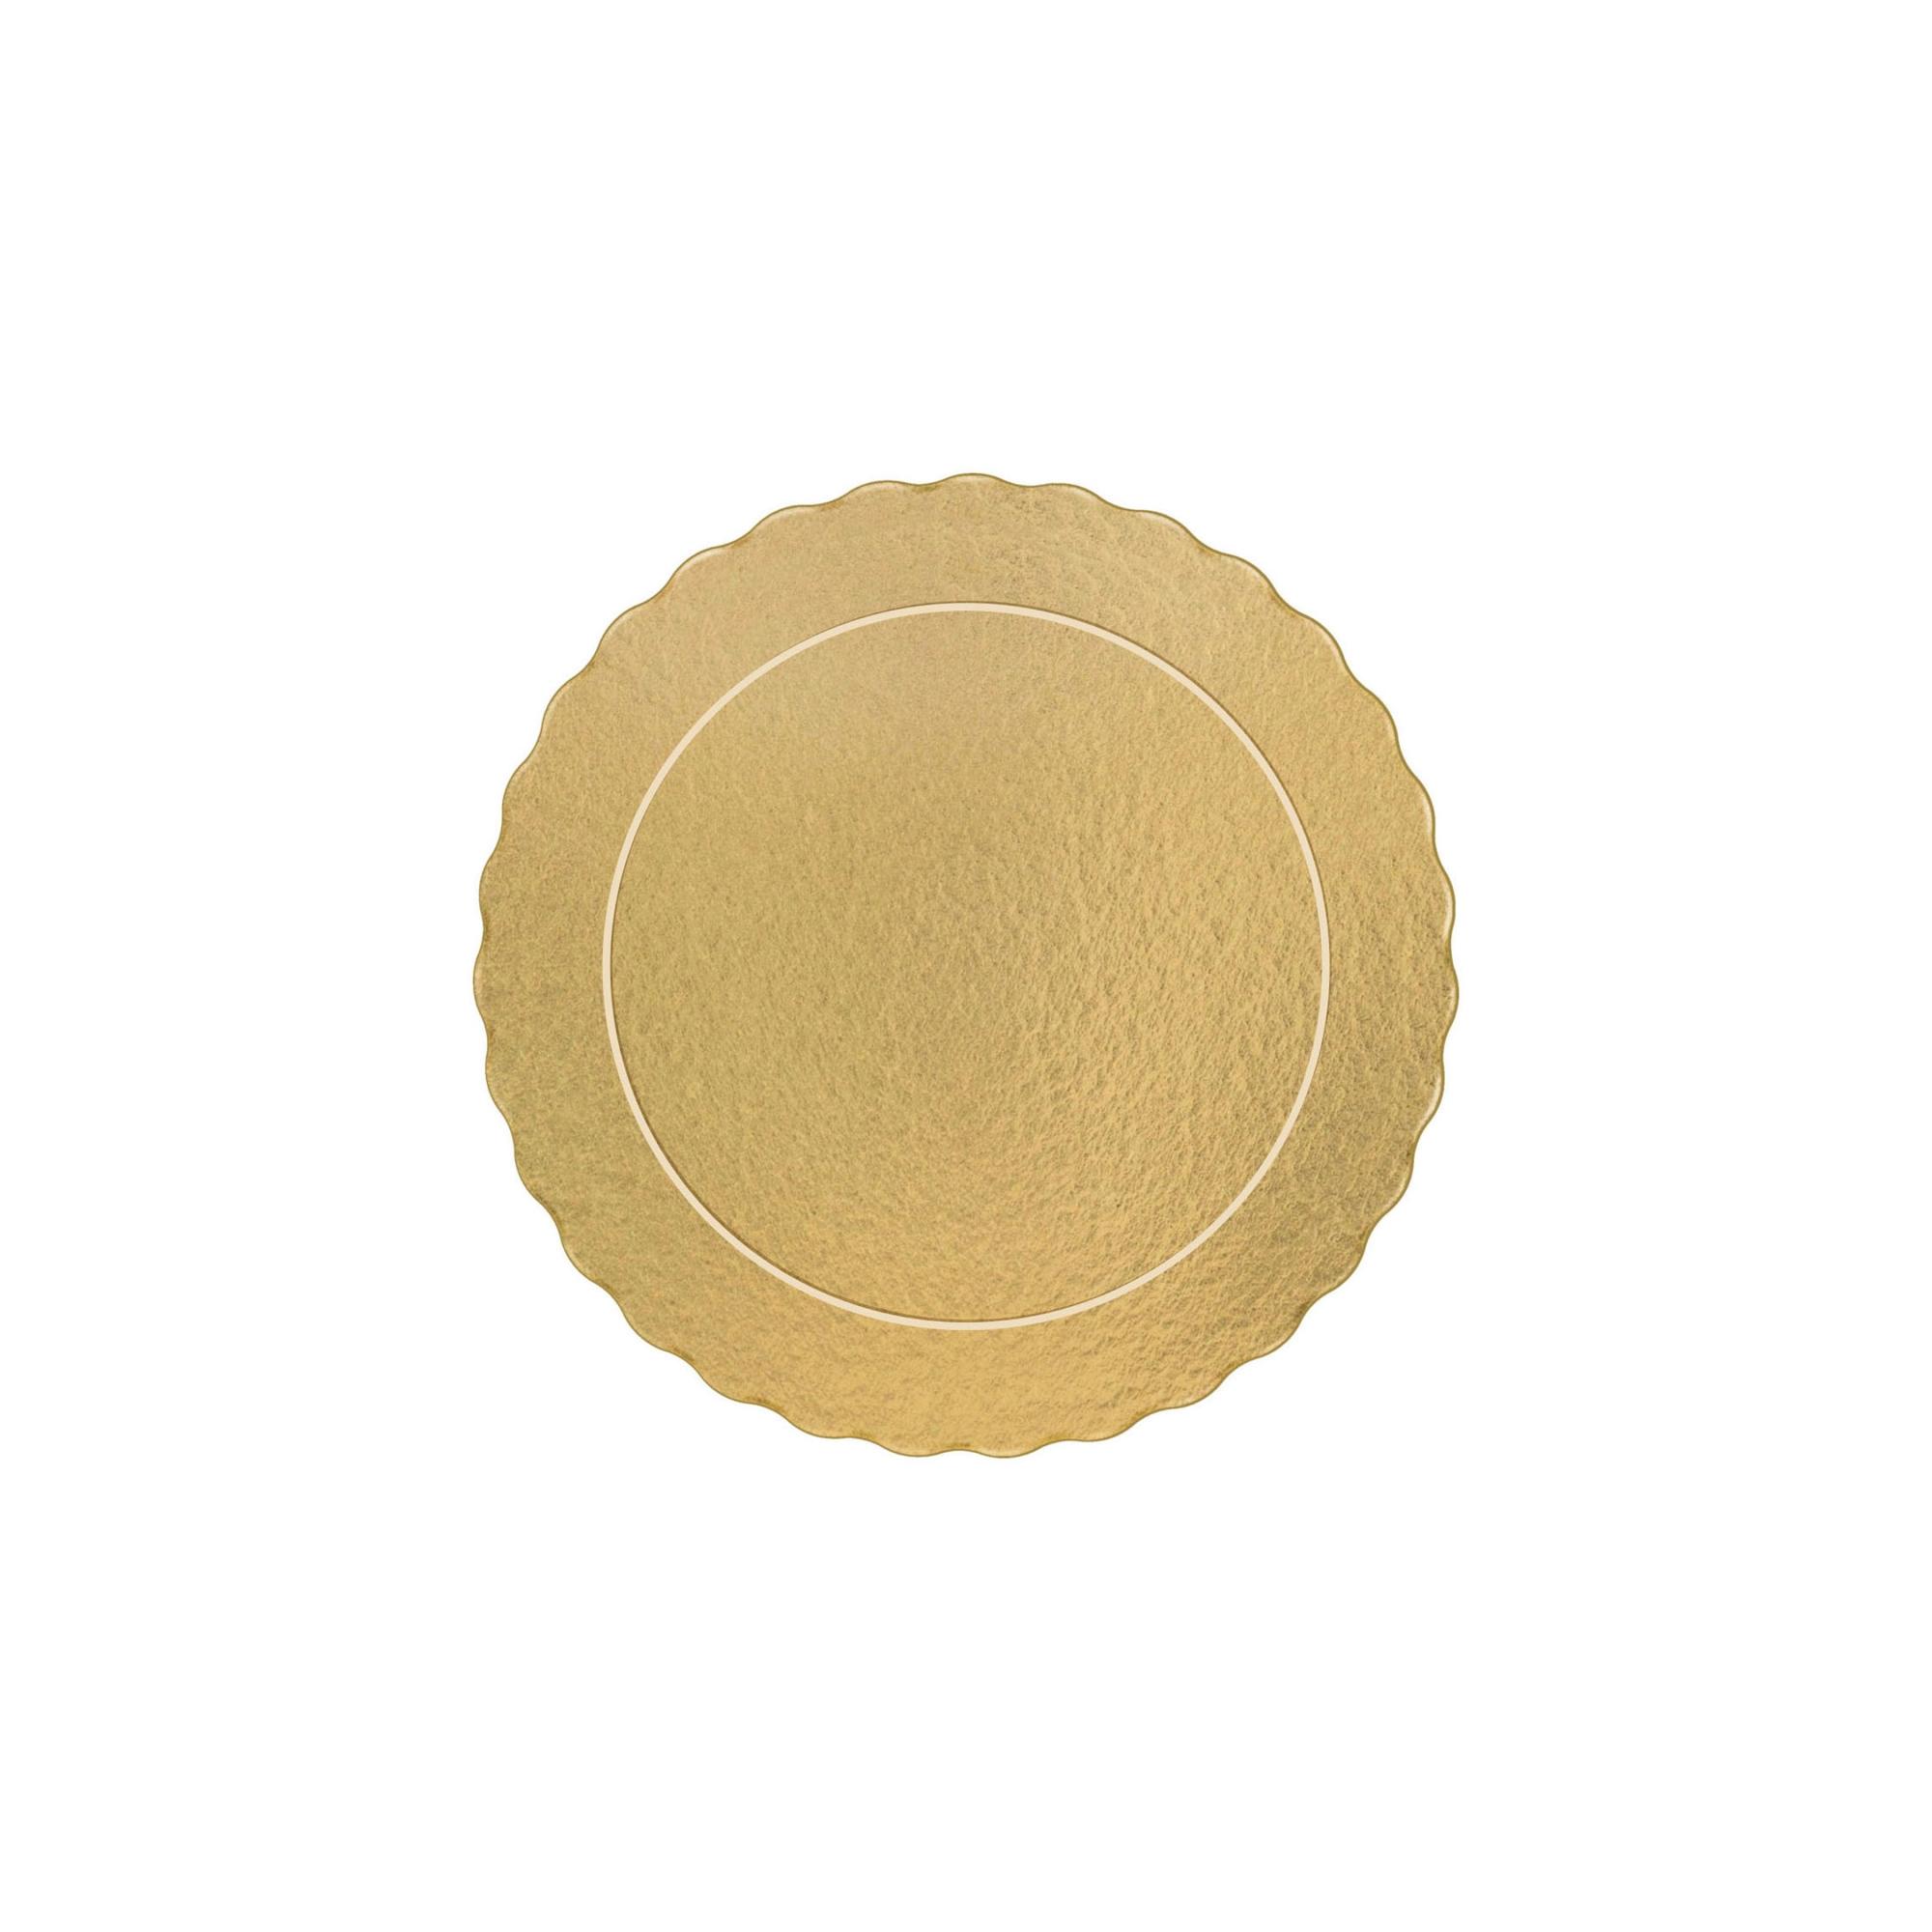 200 Bases Laminadas, Suporte P/ Bolo, Cake Board, 15cm - Ouro